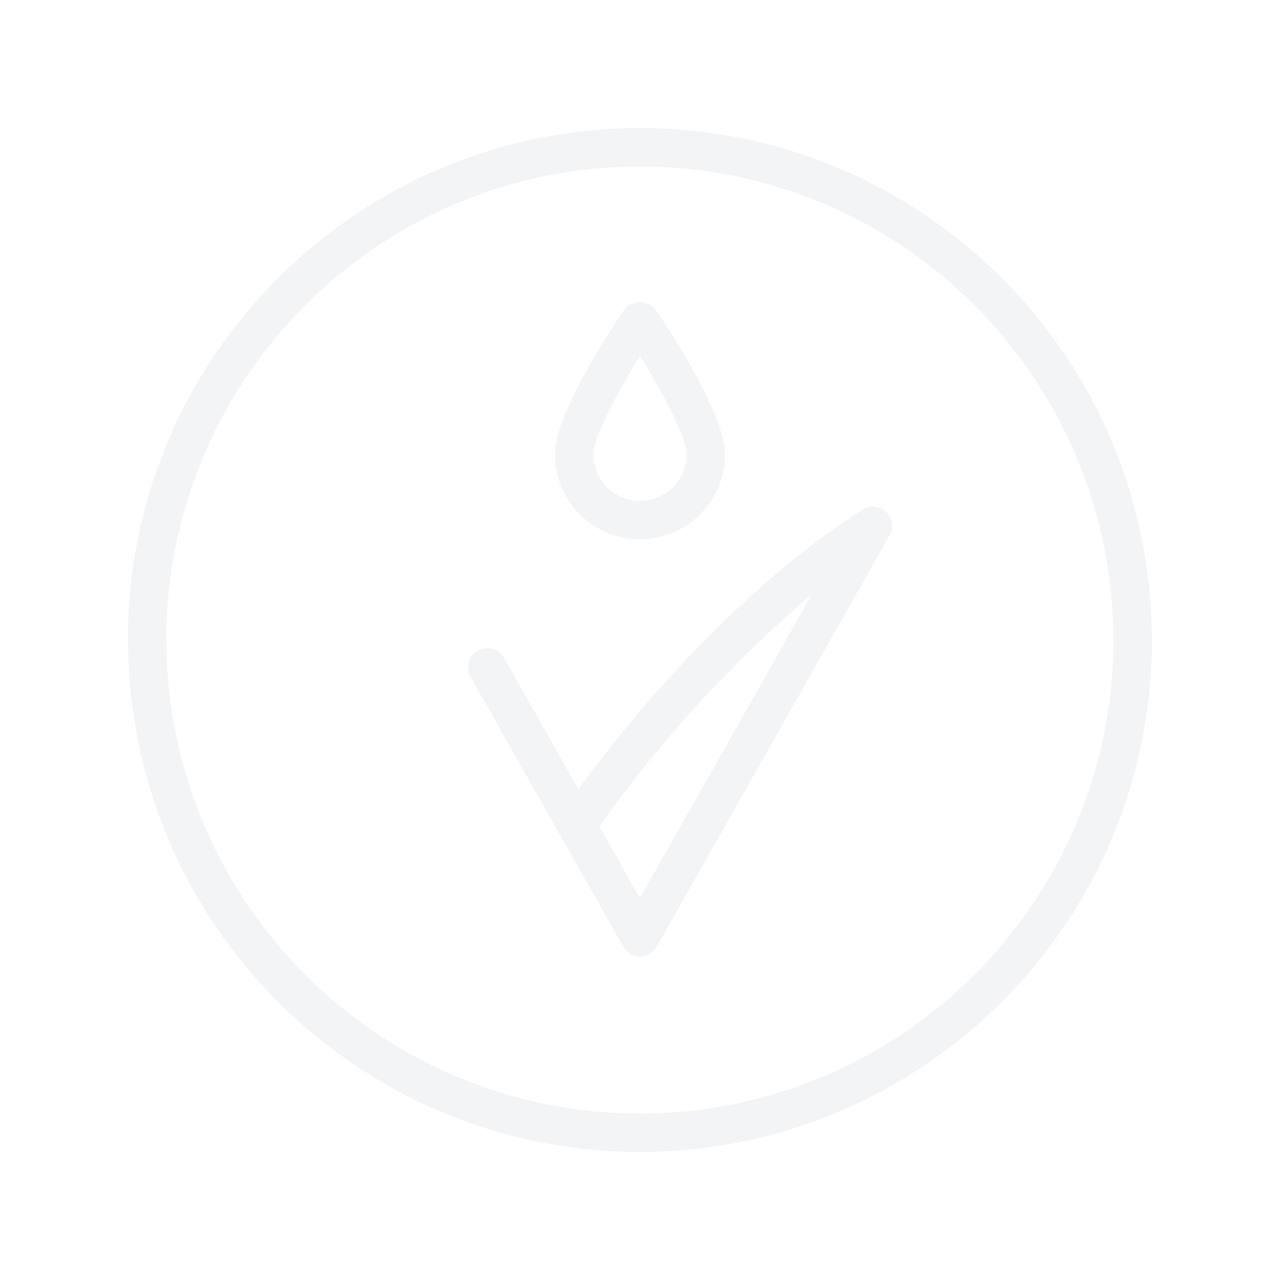 GOSH Pencil Sharpener точилка для карандашей